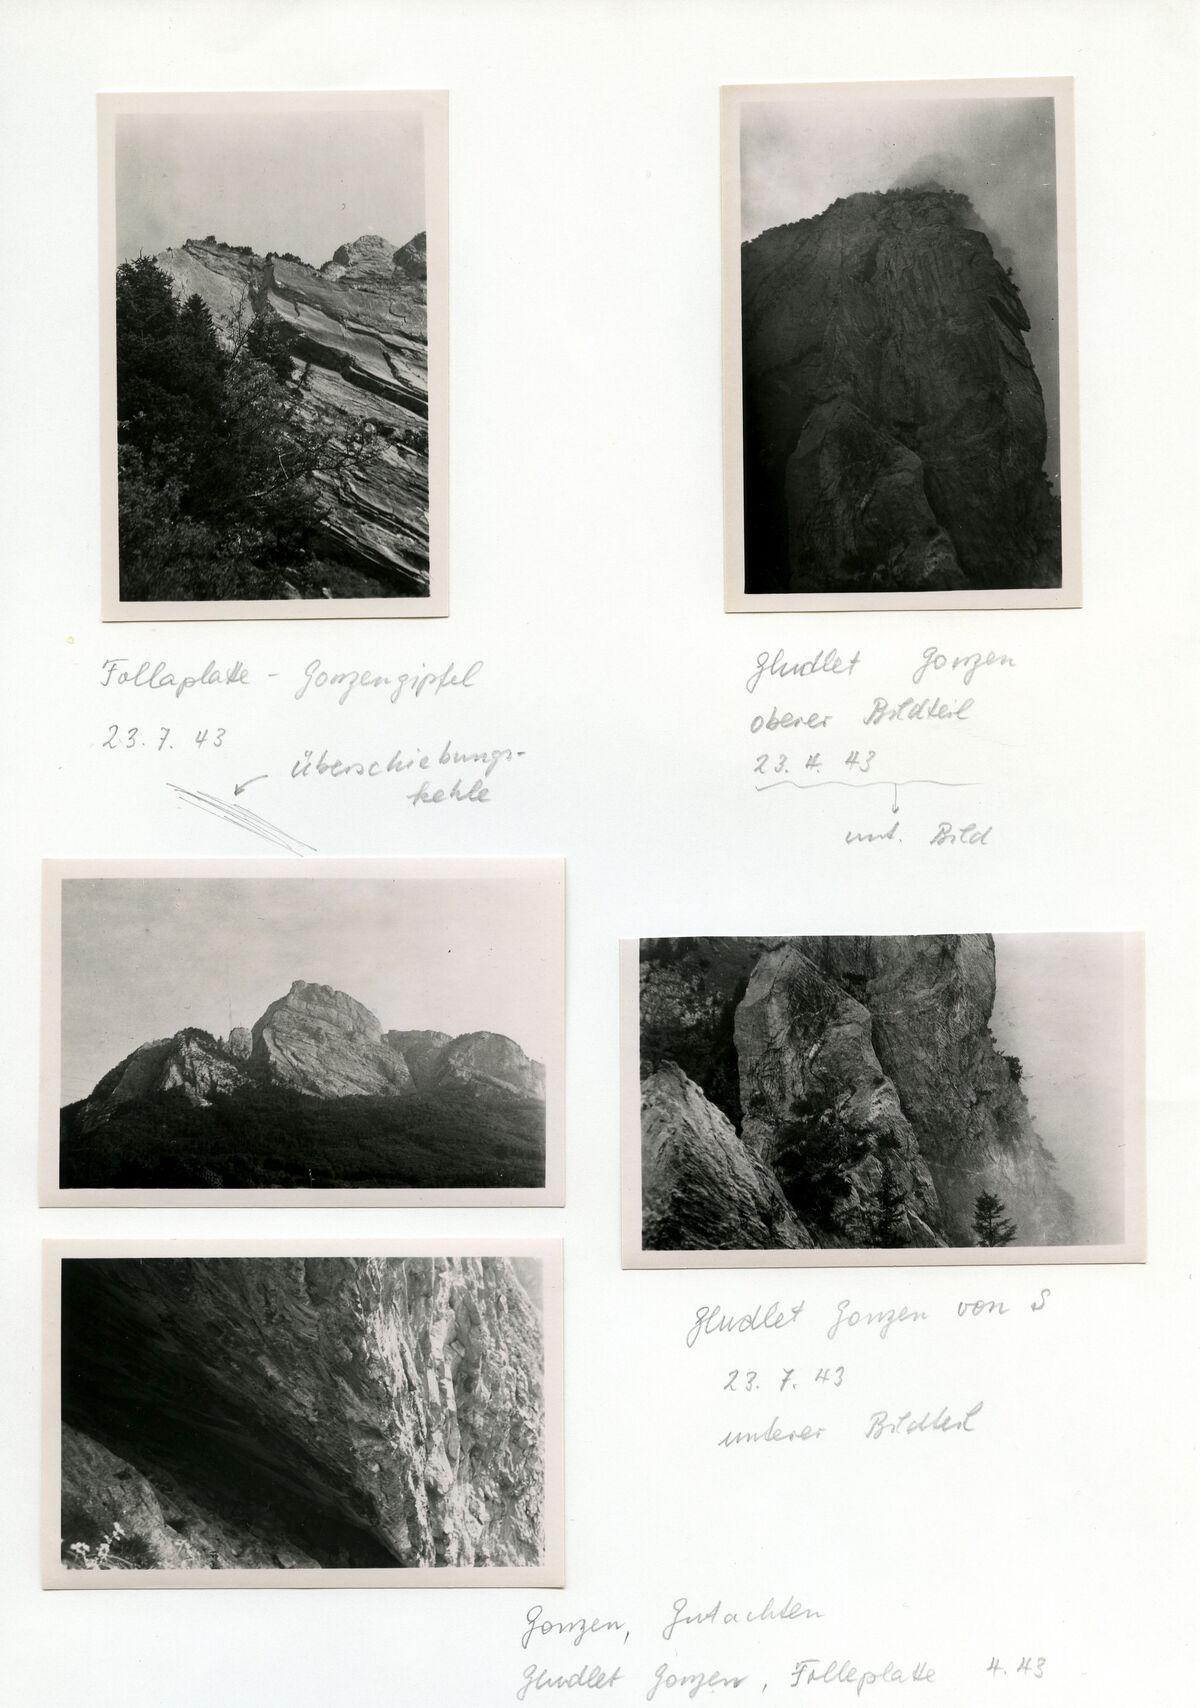 EBA 2/321.19: Landschaftsaufnahmen Gonzen aussen